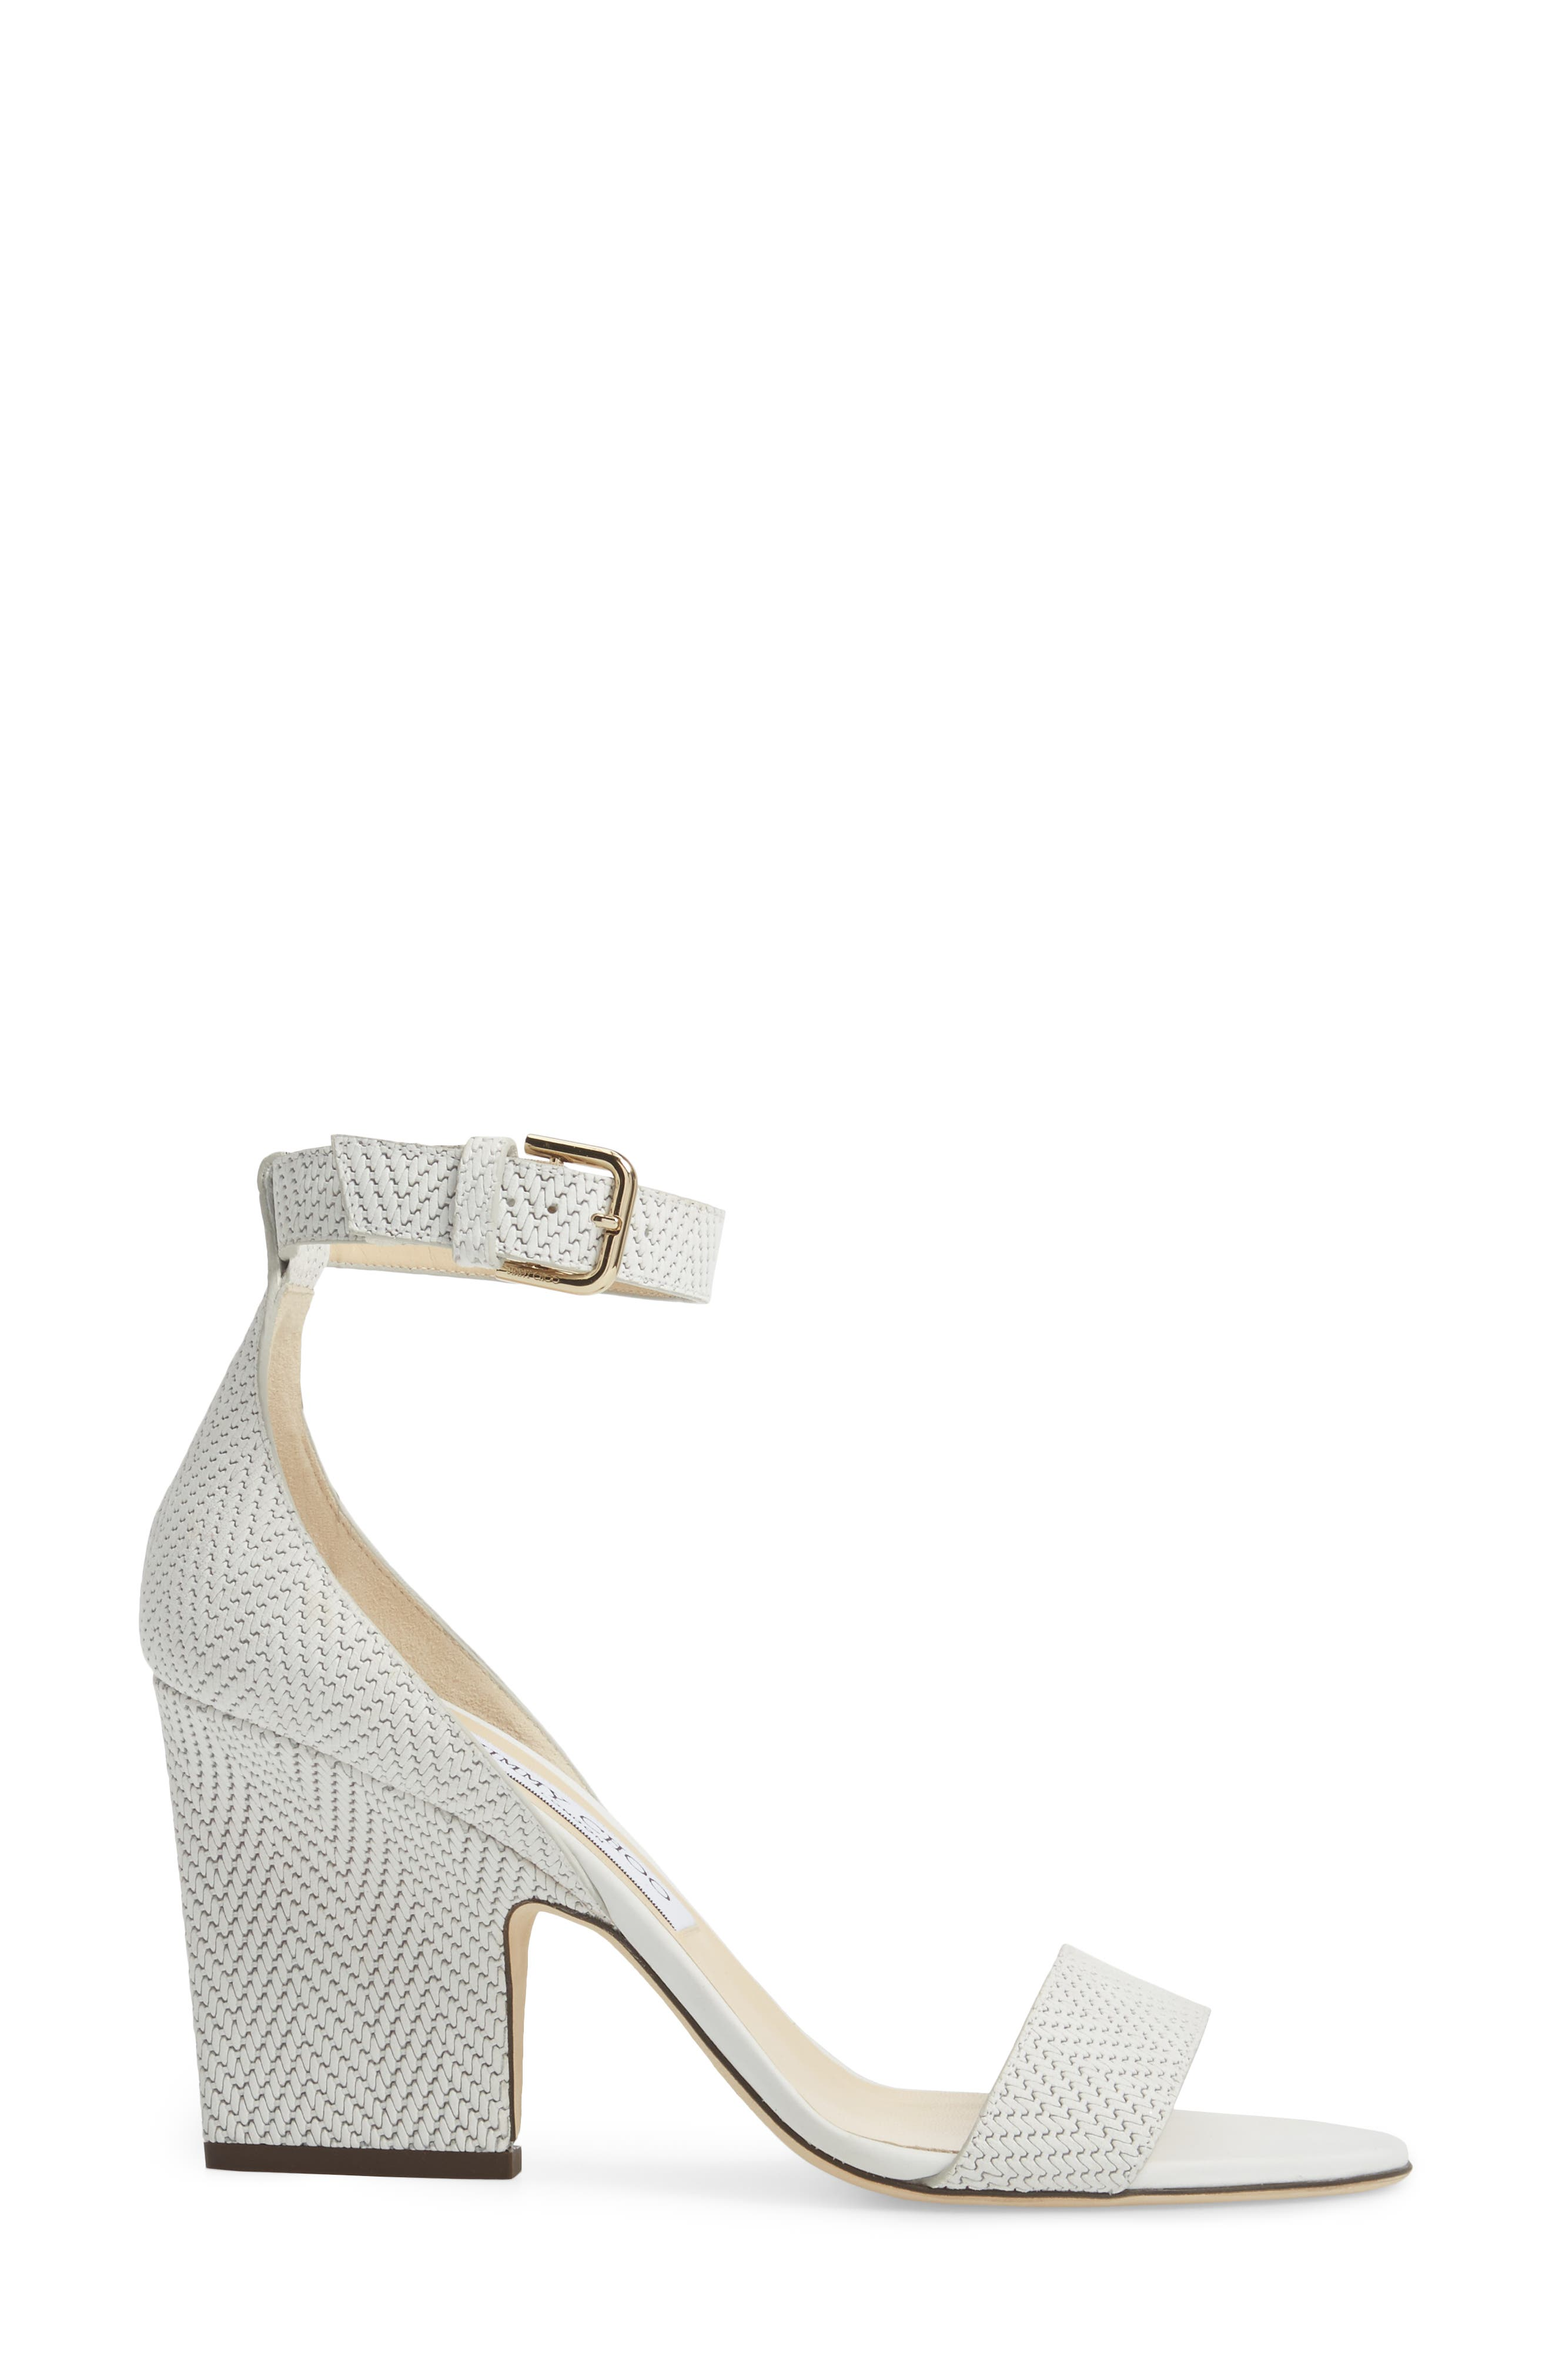 Alternate Image 3  - Jimmy Choo Edina Ankle Strap Sandal (Women)